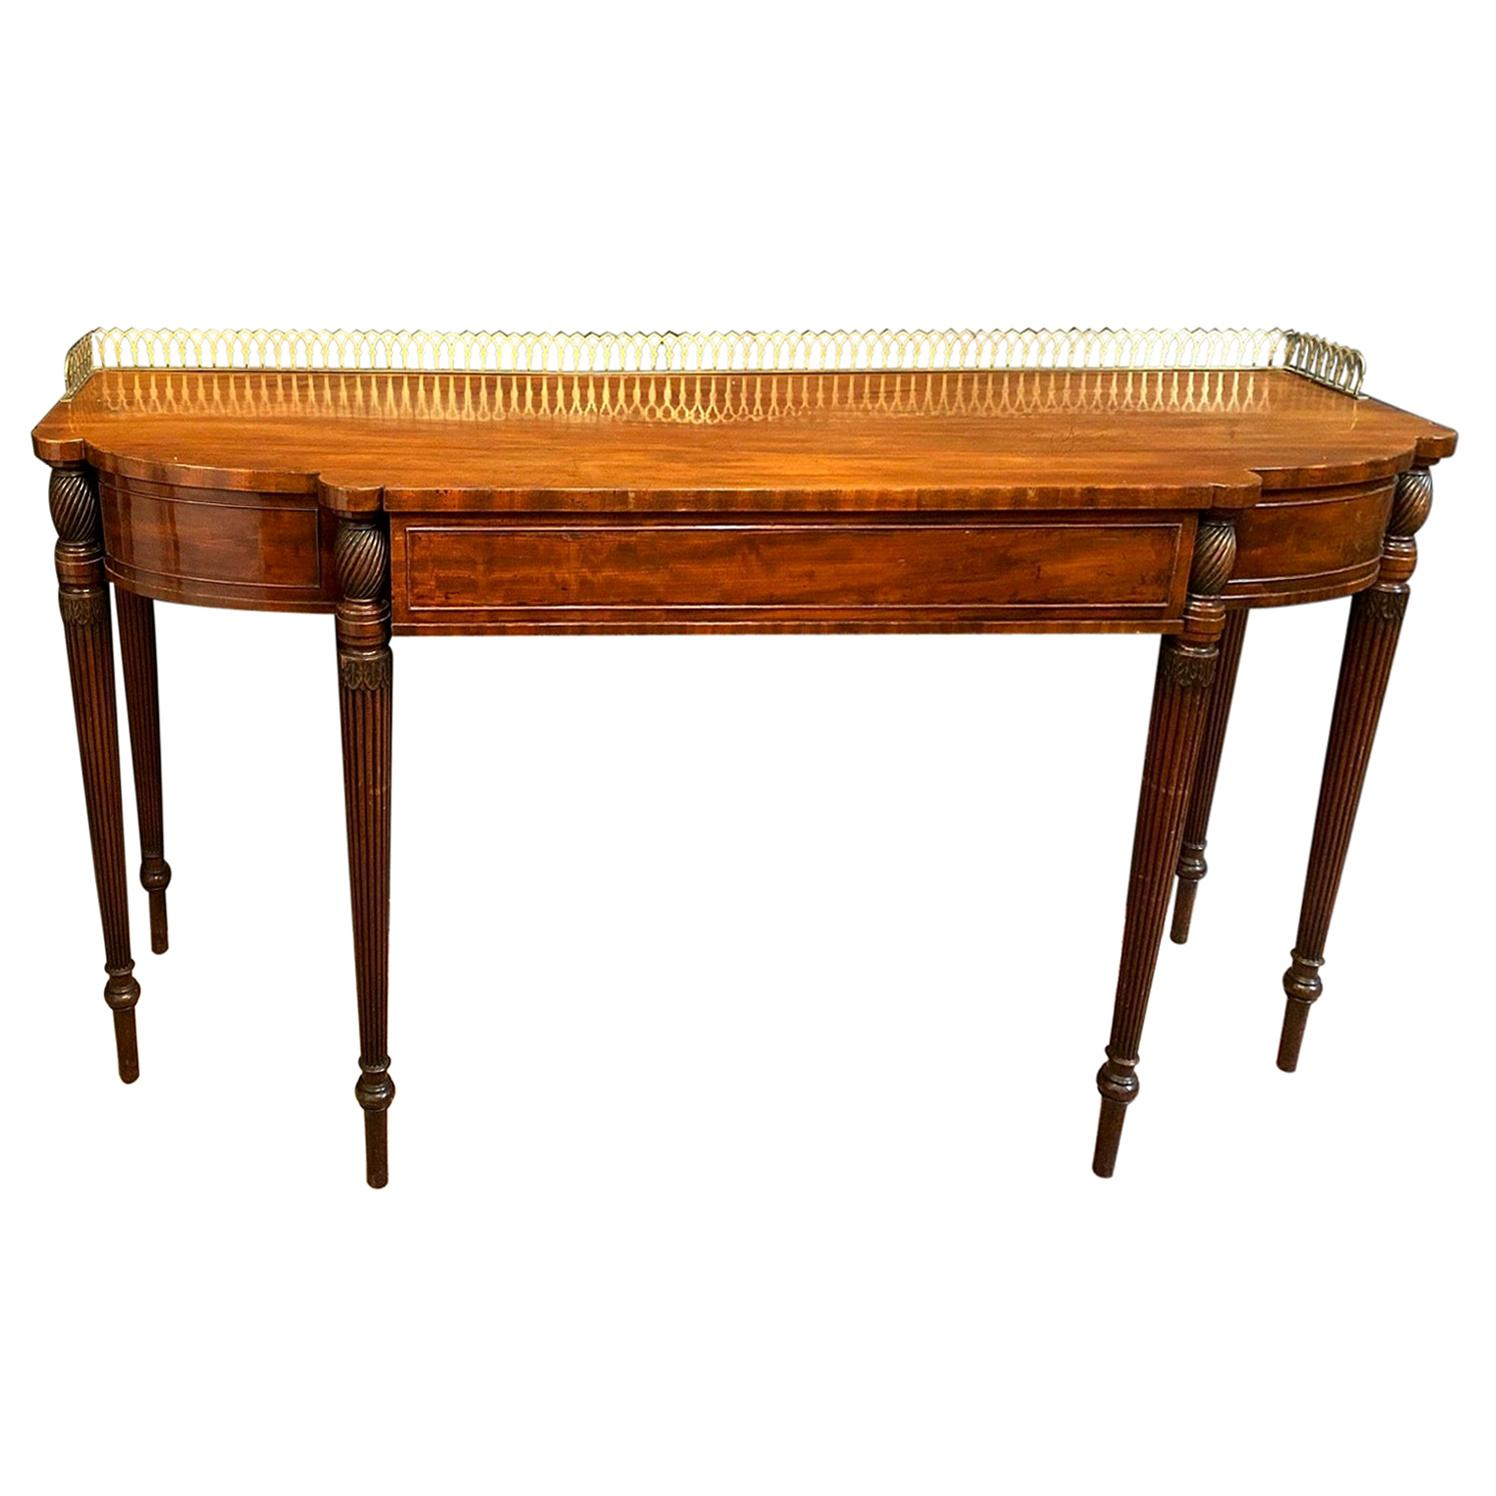 Elegant English Mahogany Ormolu Mounted Dessert Console Table, circa 1810